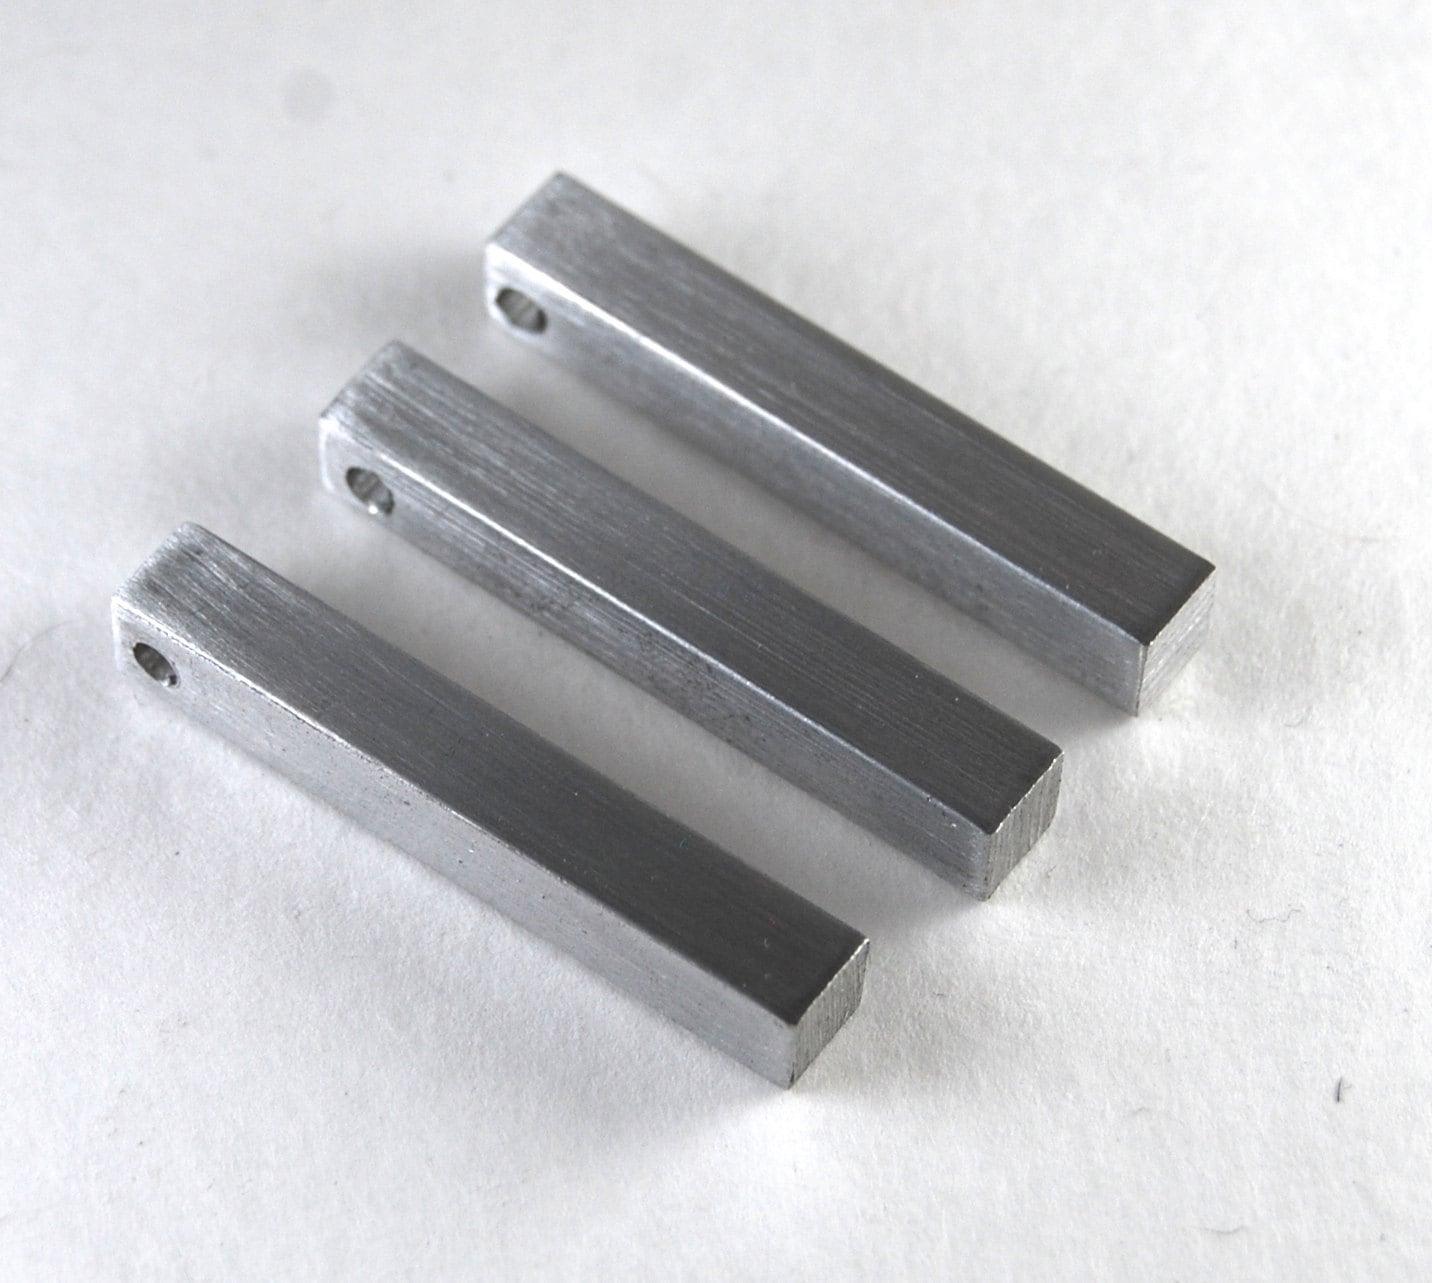 Aluminum Metal Suppliers : Wholesale stamping blanks aluminum bar you choose